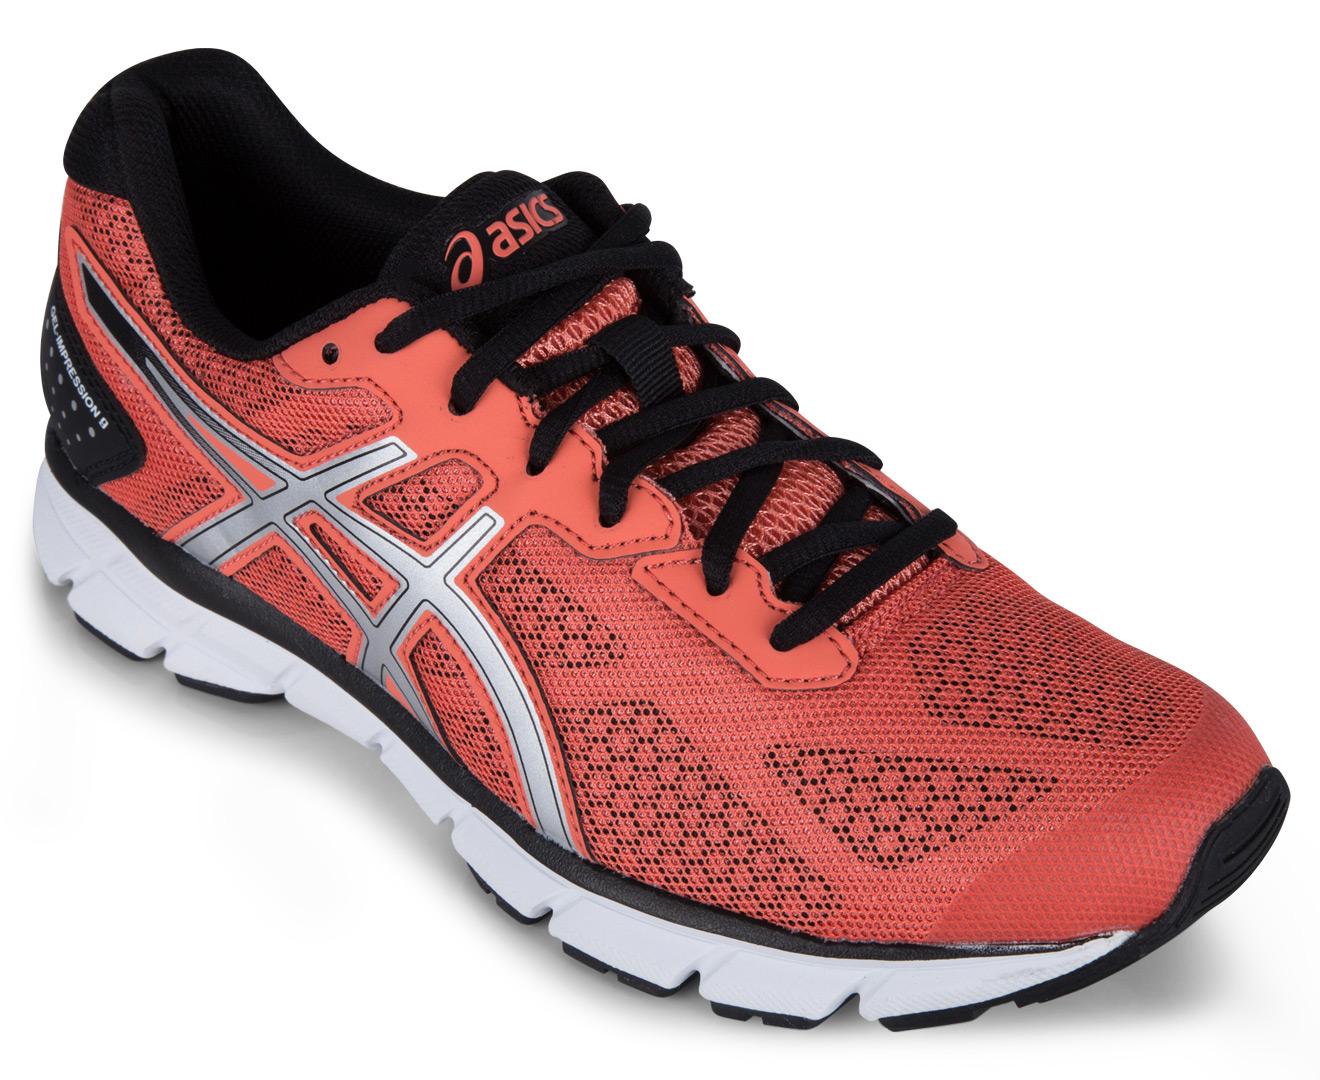 1f0df0faf0 ASICS Women s GEL-Impression 9 Shoe - Flash Coral Silver Black ...